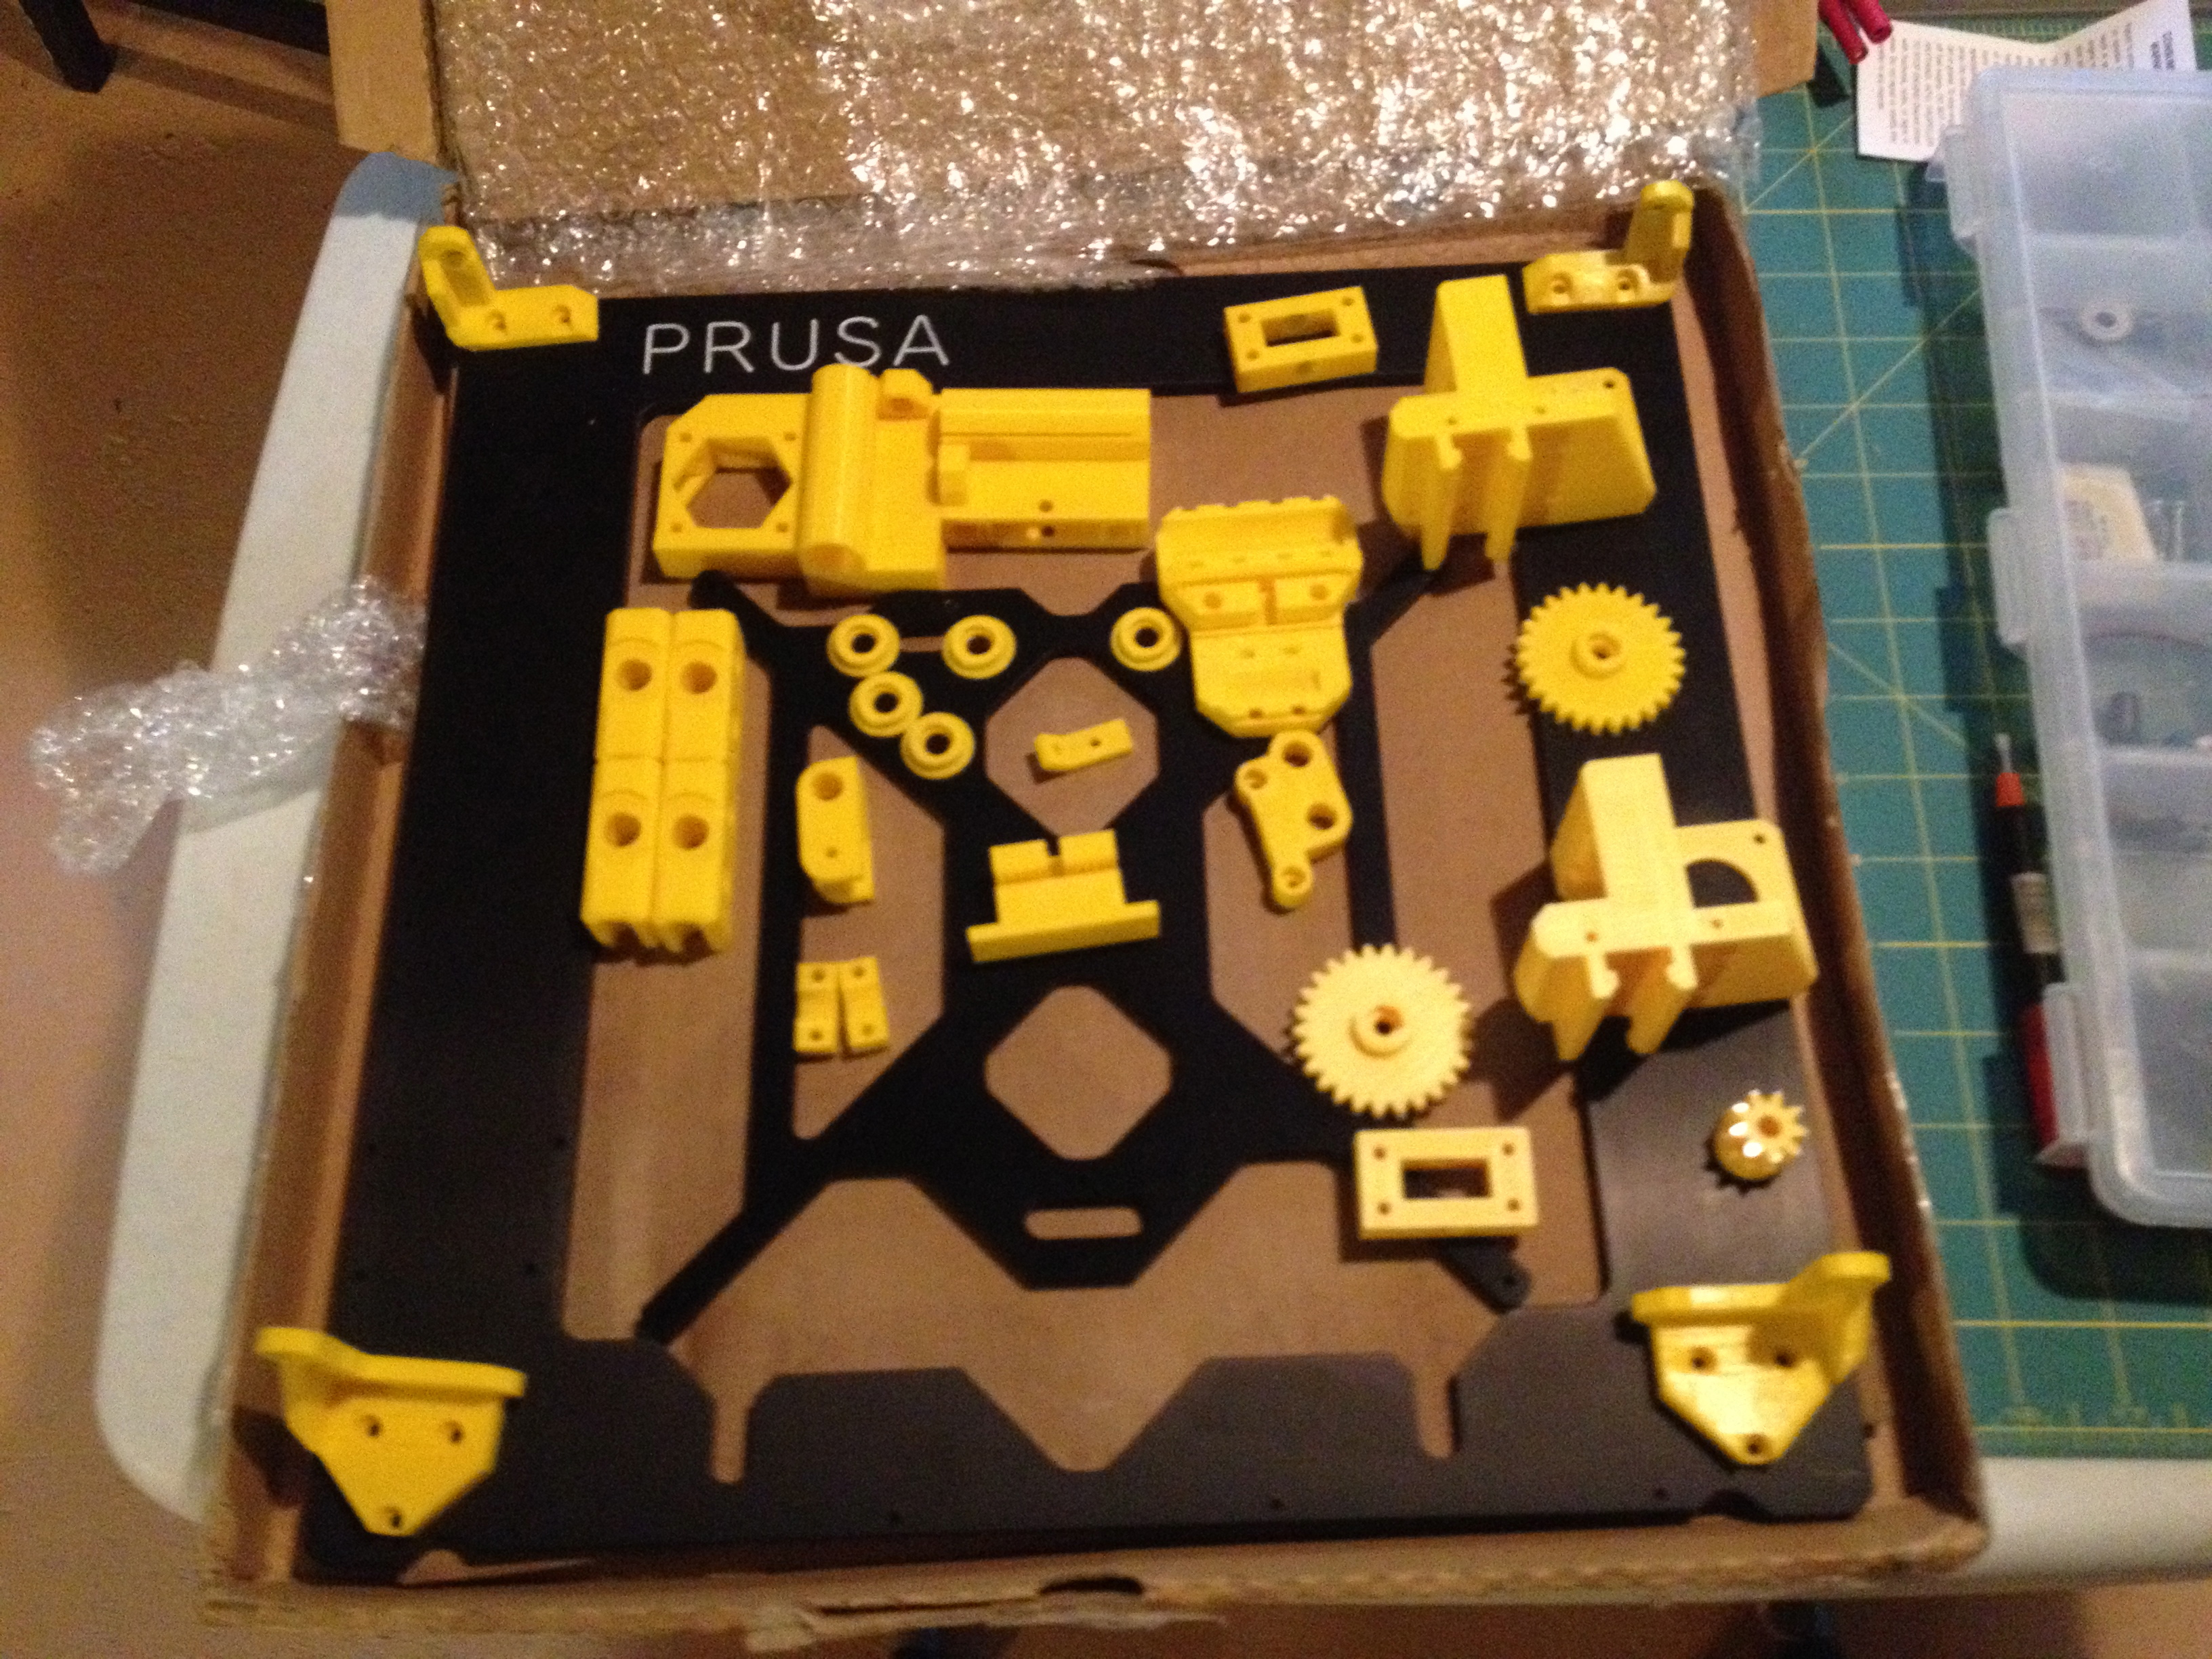 File:Prusa i3 Printer parts.jpg - Wikimedia Commons